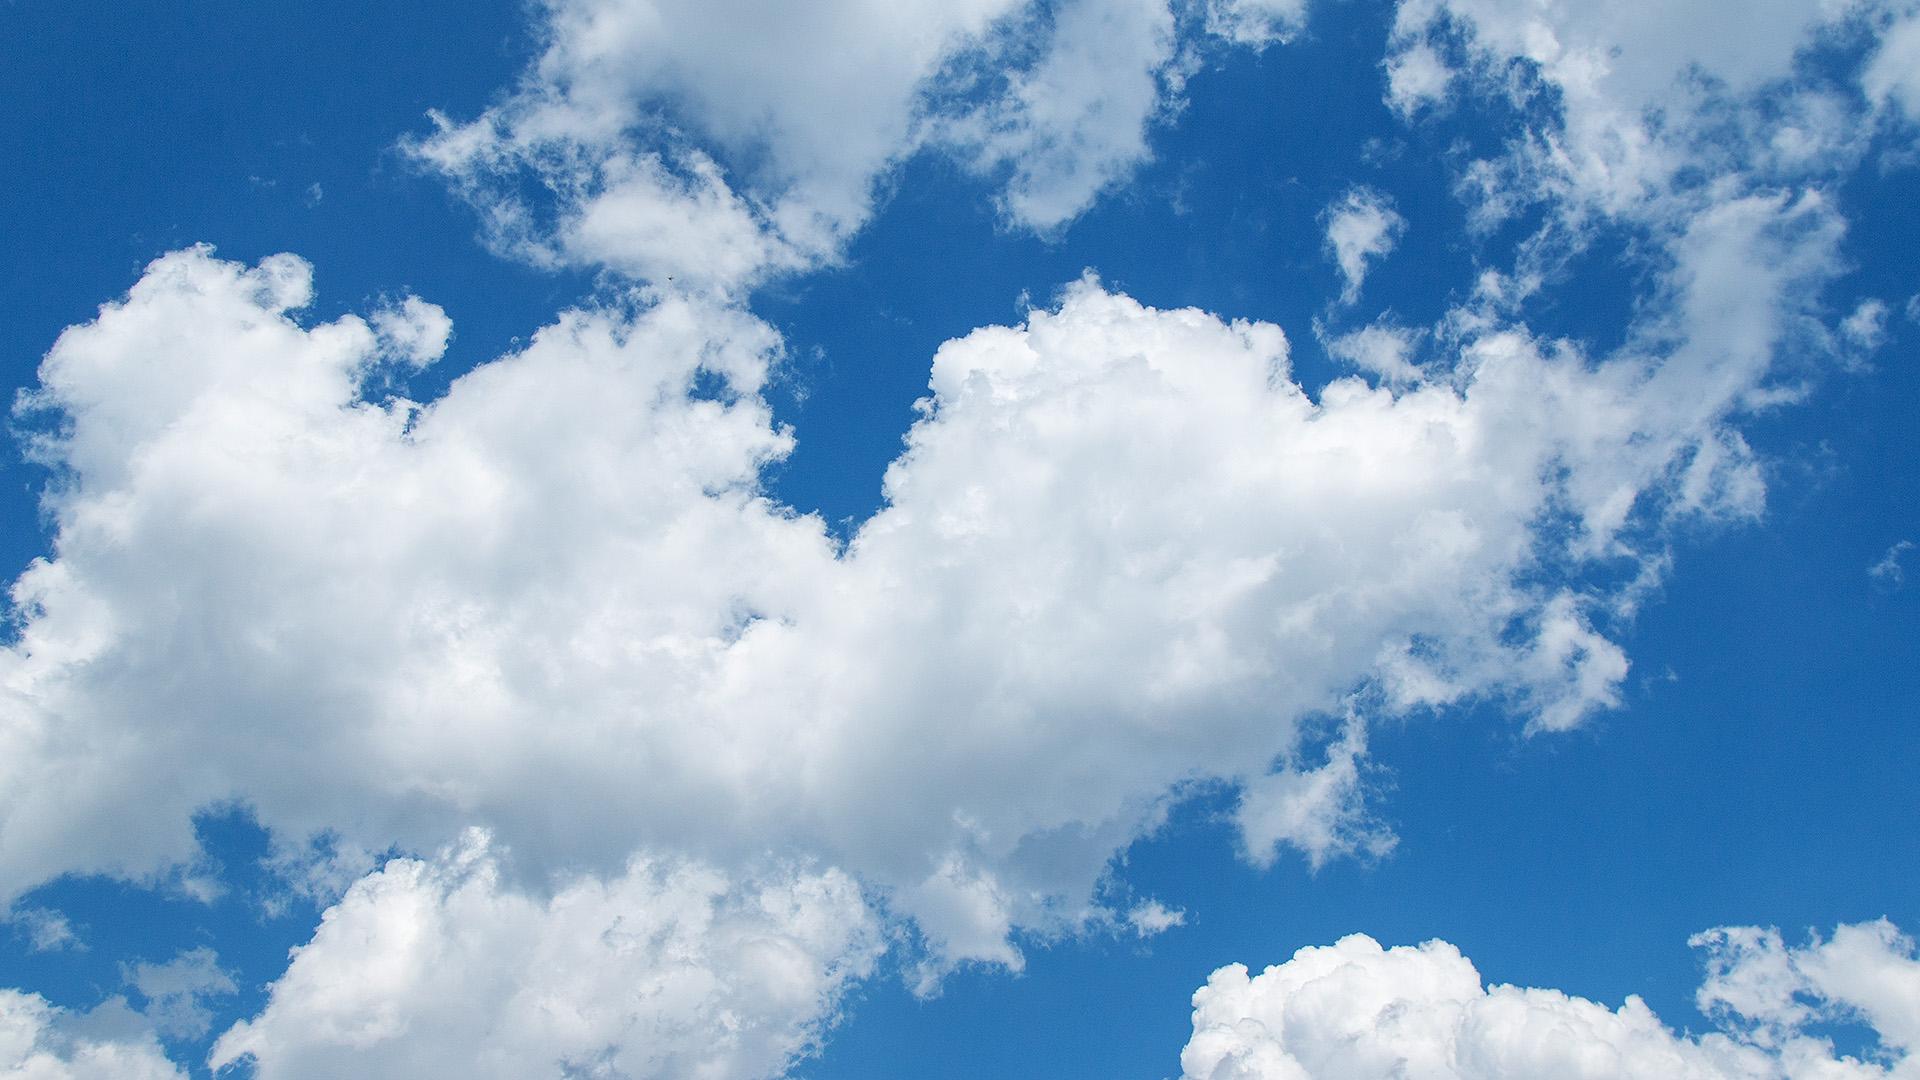 Wolken am himmel himmel mit wolken himmel № 31574